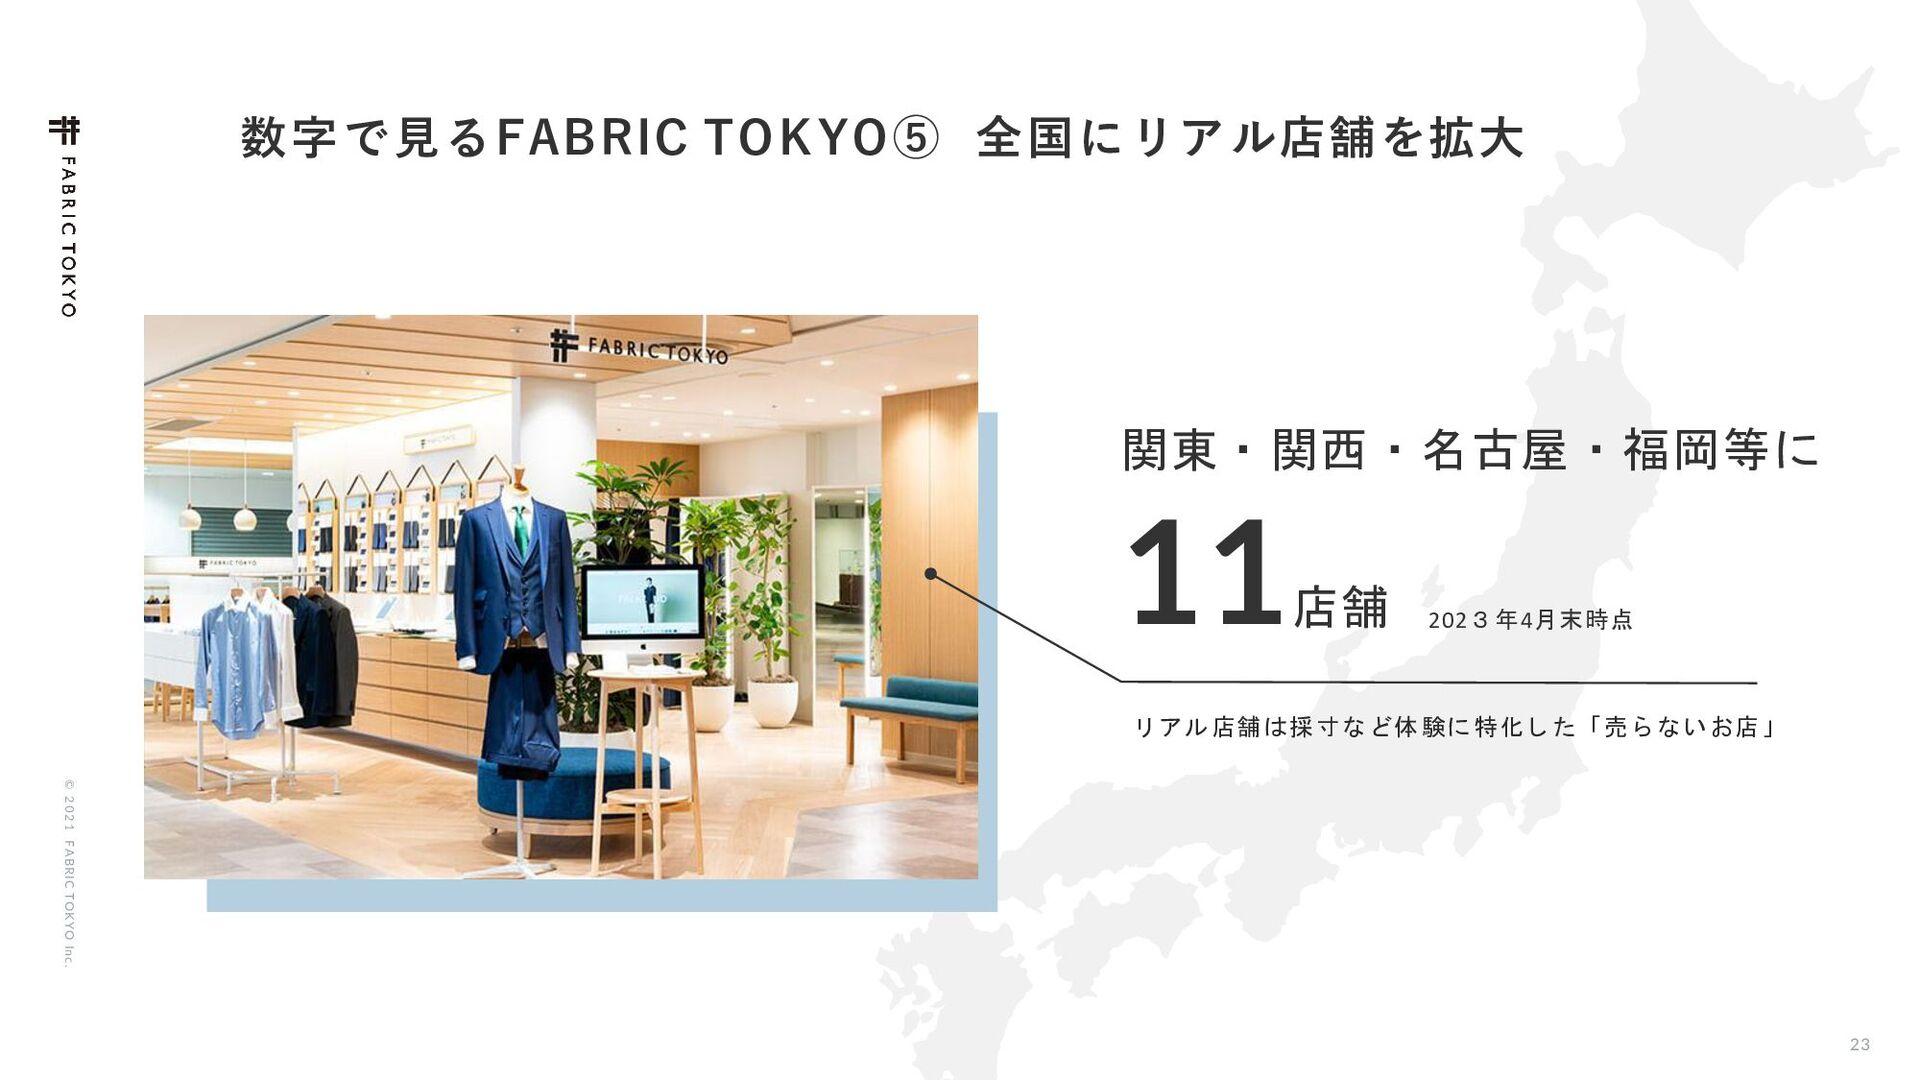 "© 2021 FABRIC TOKYO Inc. 23 ͰݟΔ'""#3*$ 50,:0ᶇ ..."